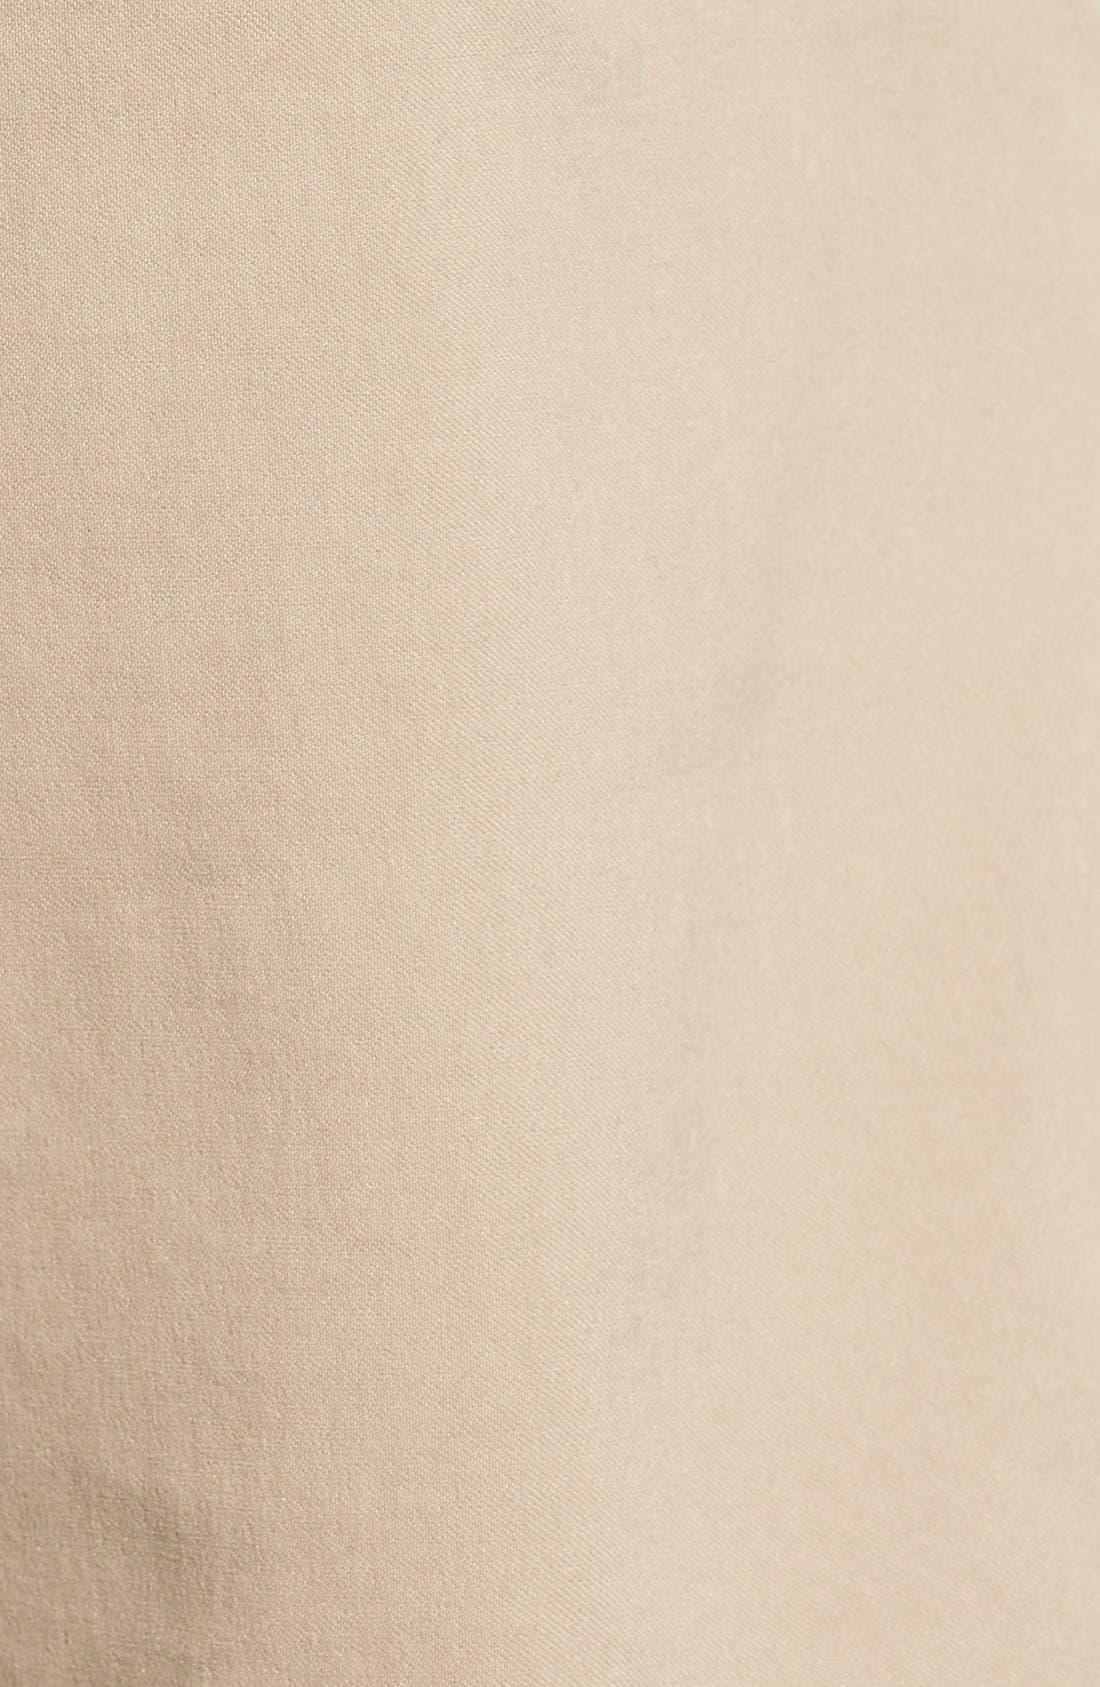 Zion Stretch Shorts,                             Alternate thumbnail 5, color,                             Dark Khaki